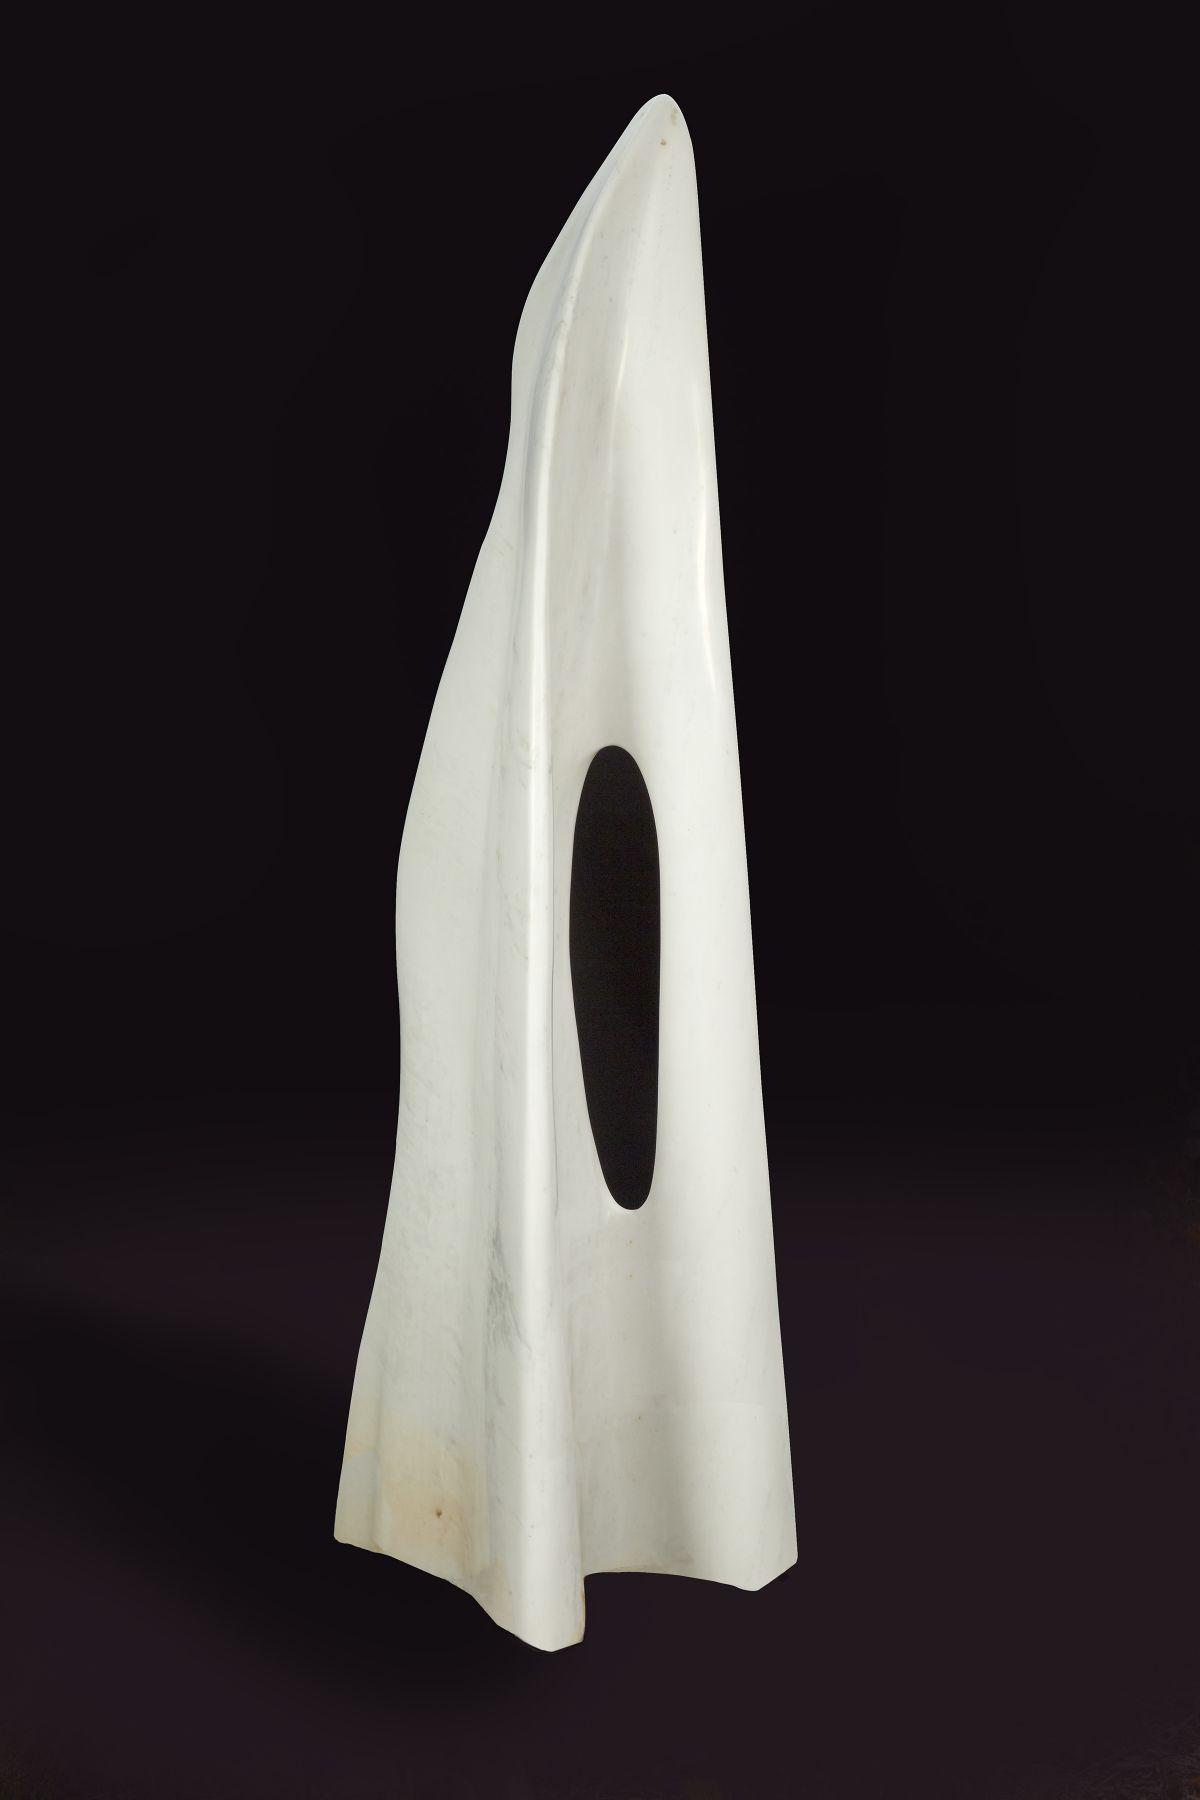 Soaring, 2012 Bianco Puro Carrara Marble